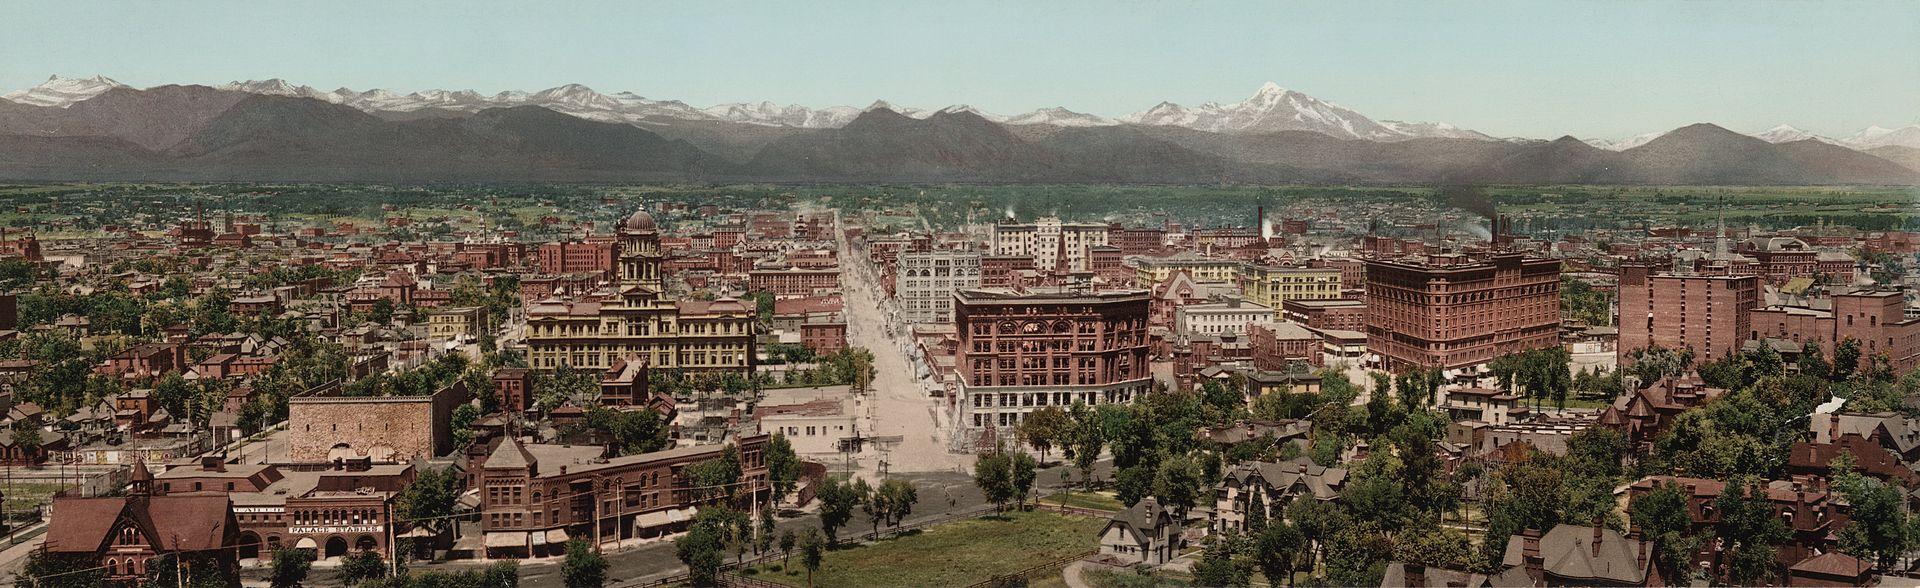 Panorama of Denver circa 1898